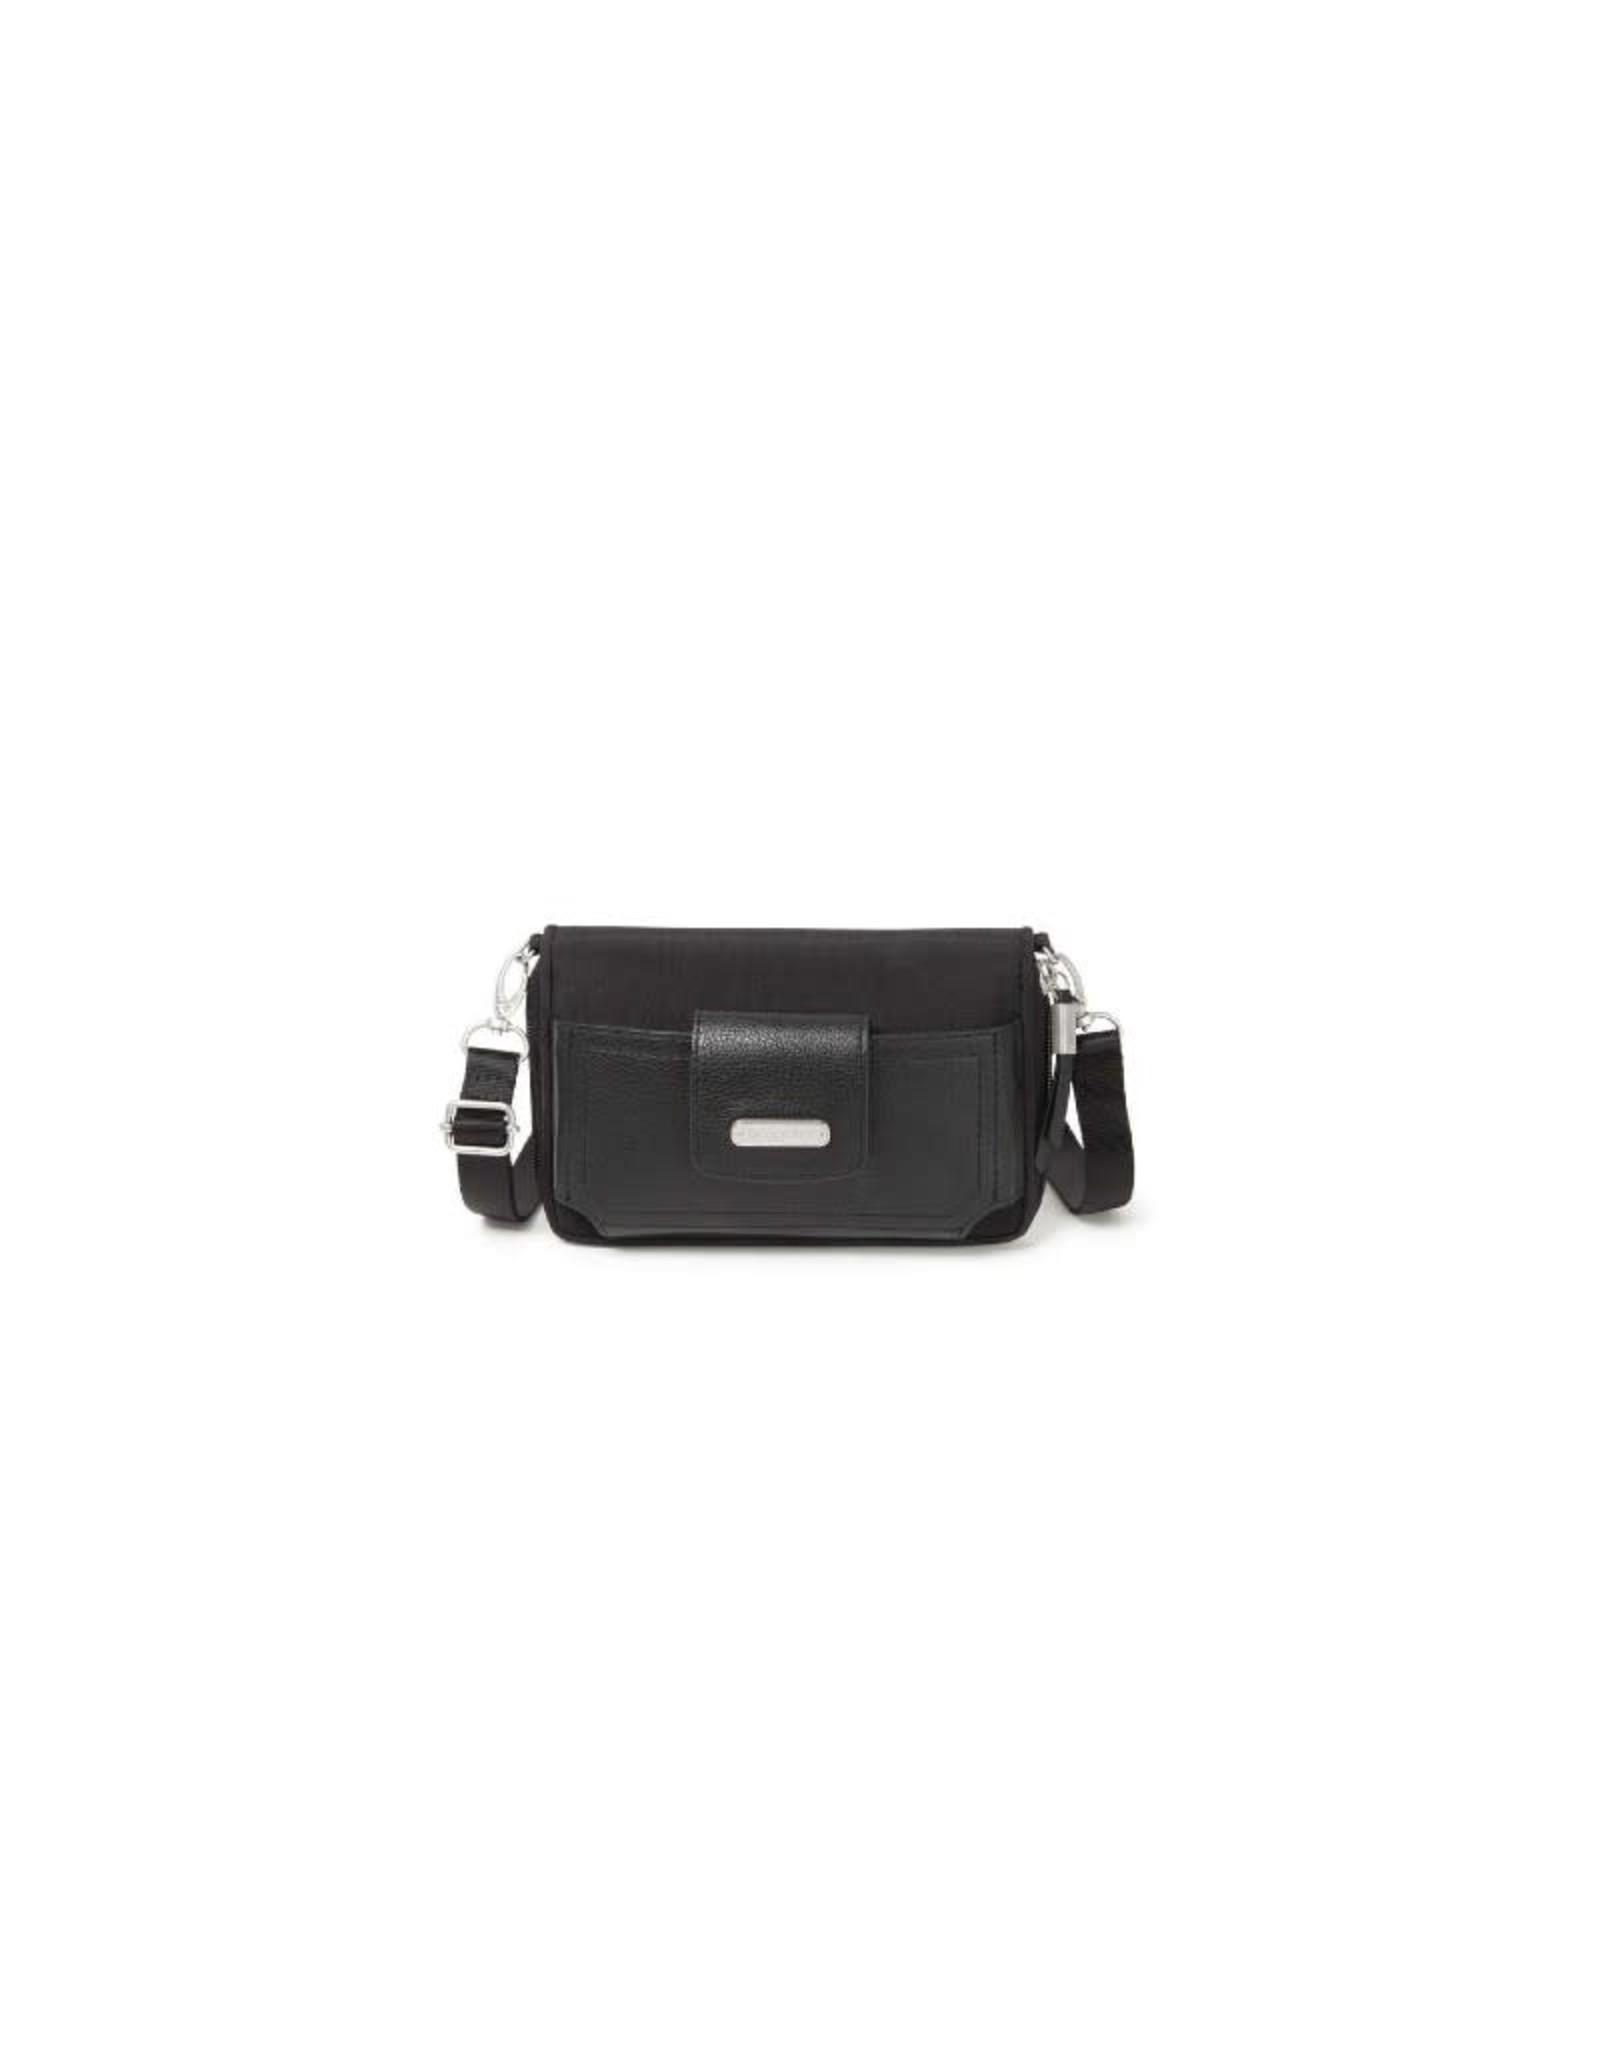 Baggallini RFID Phone Wallet Crossbody